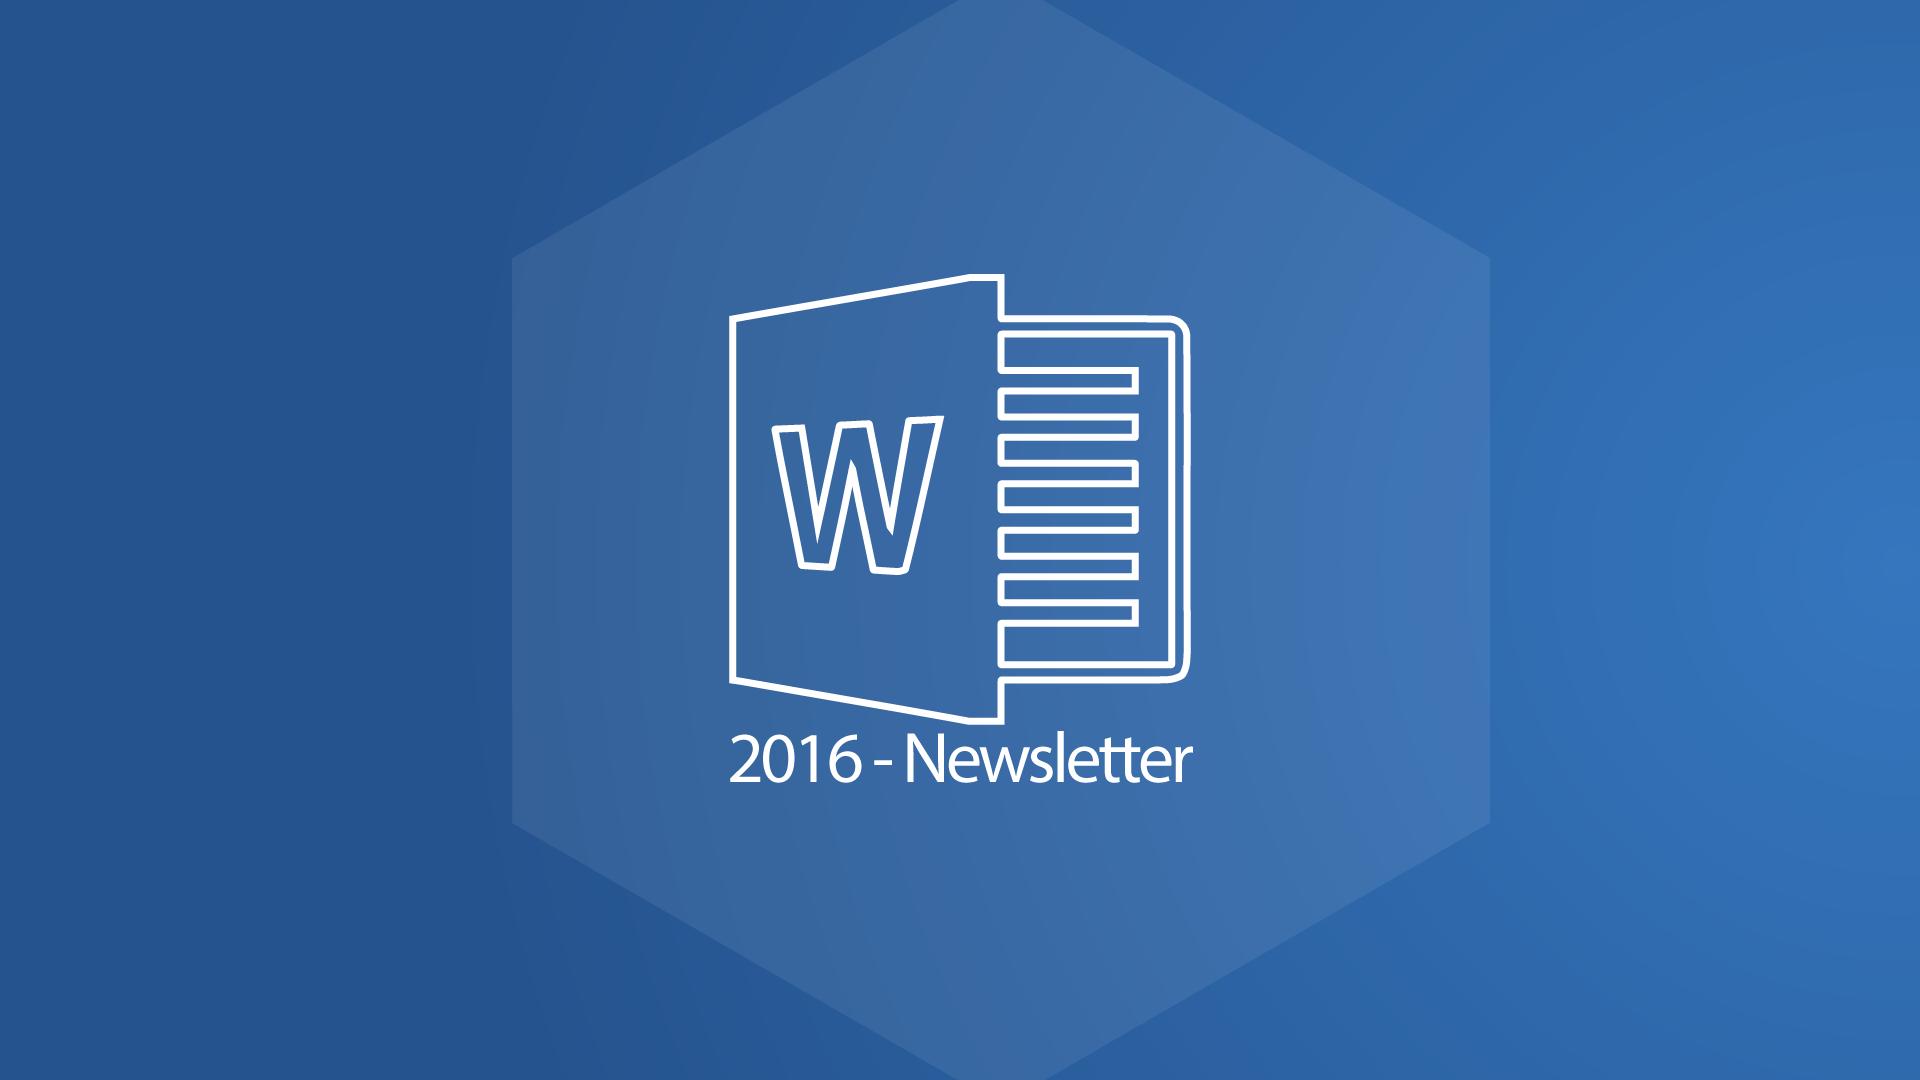 Word 2016 Newsletter